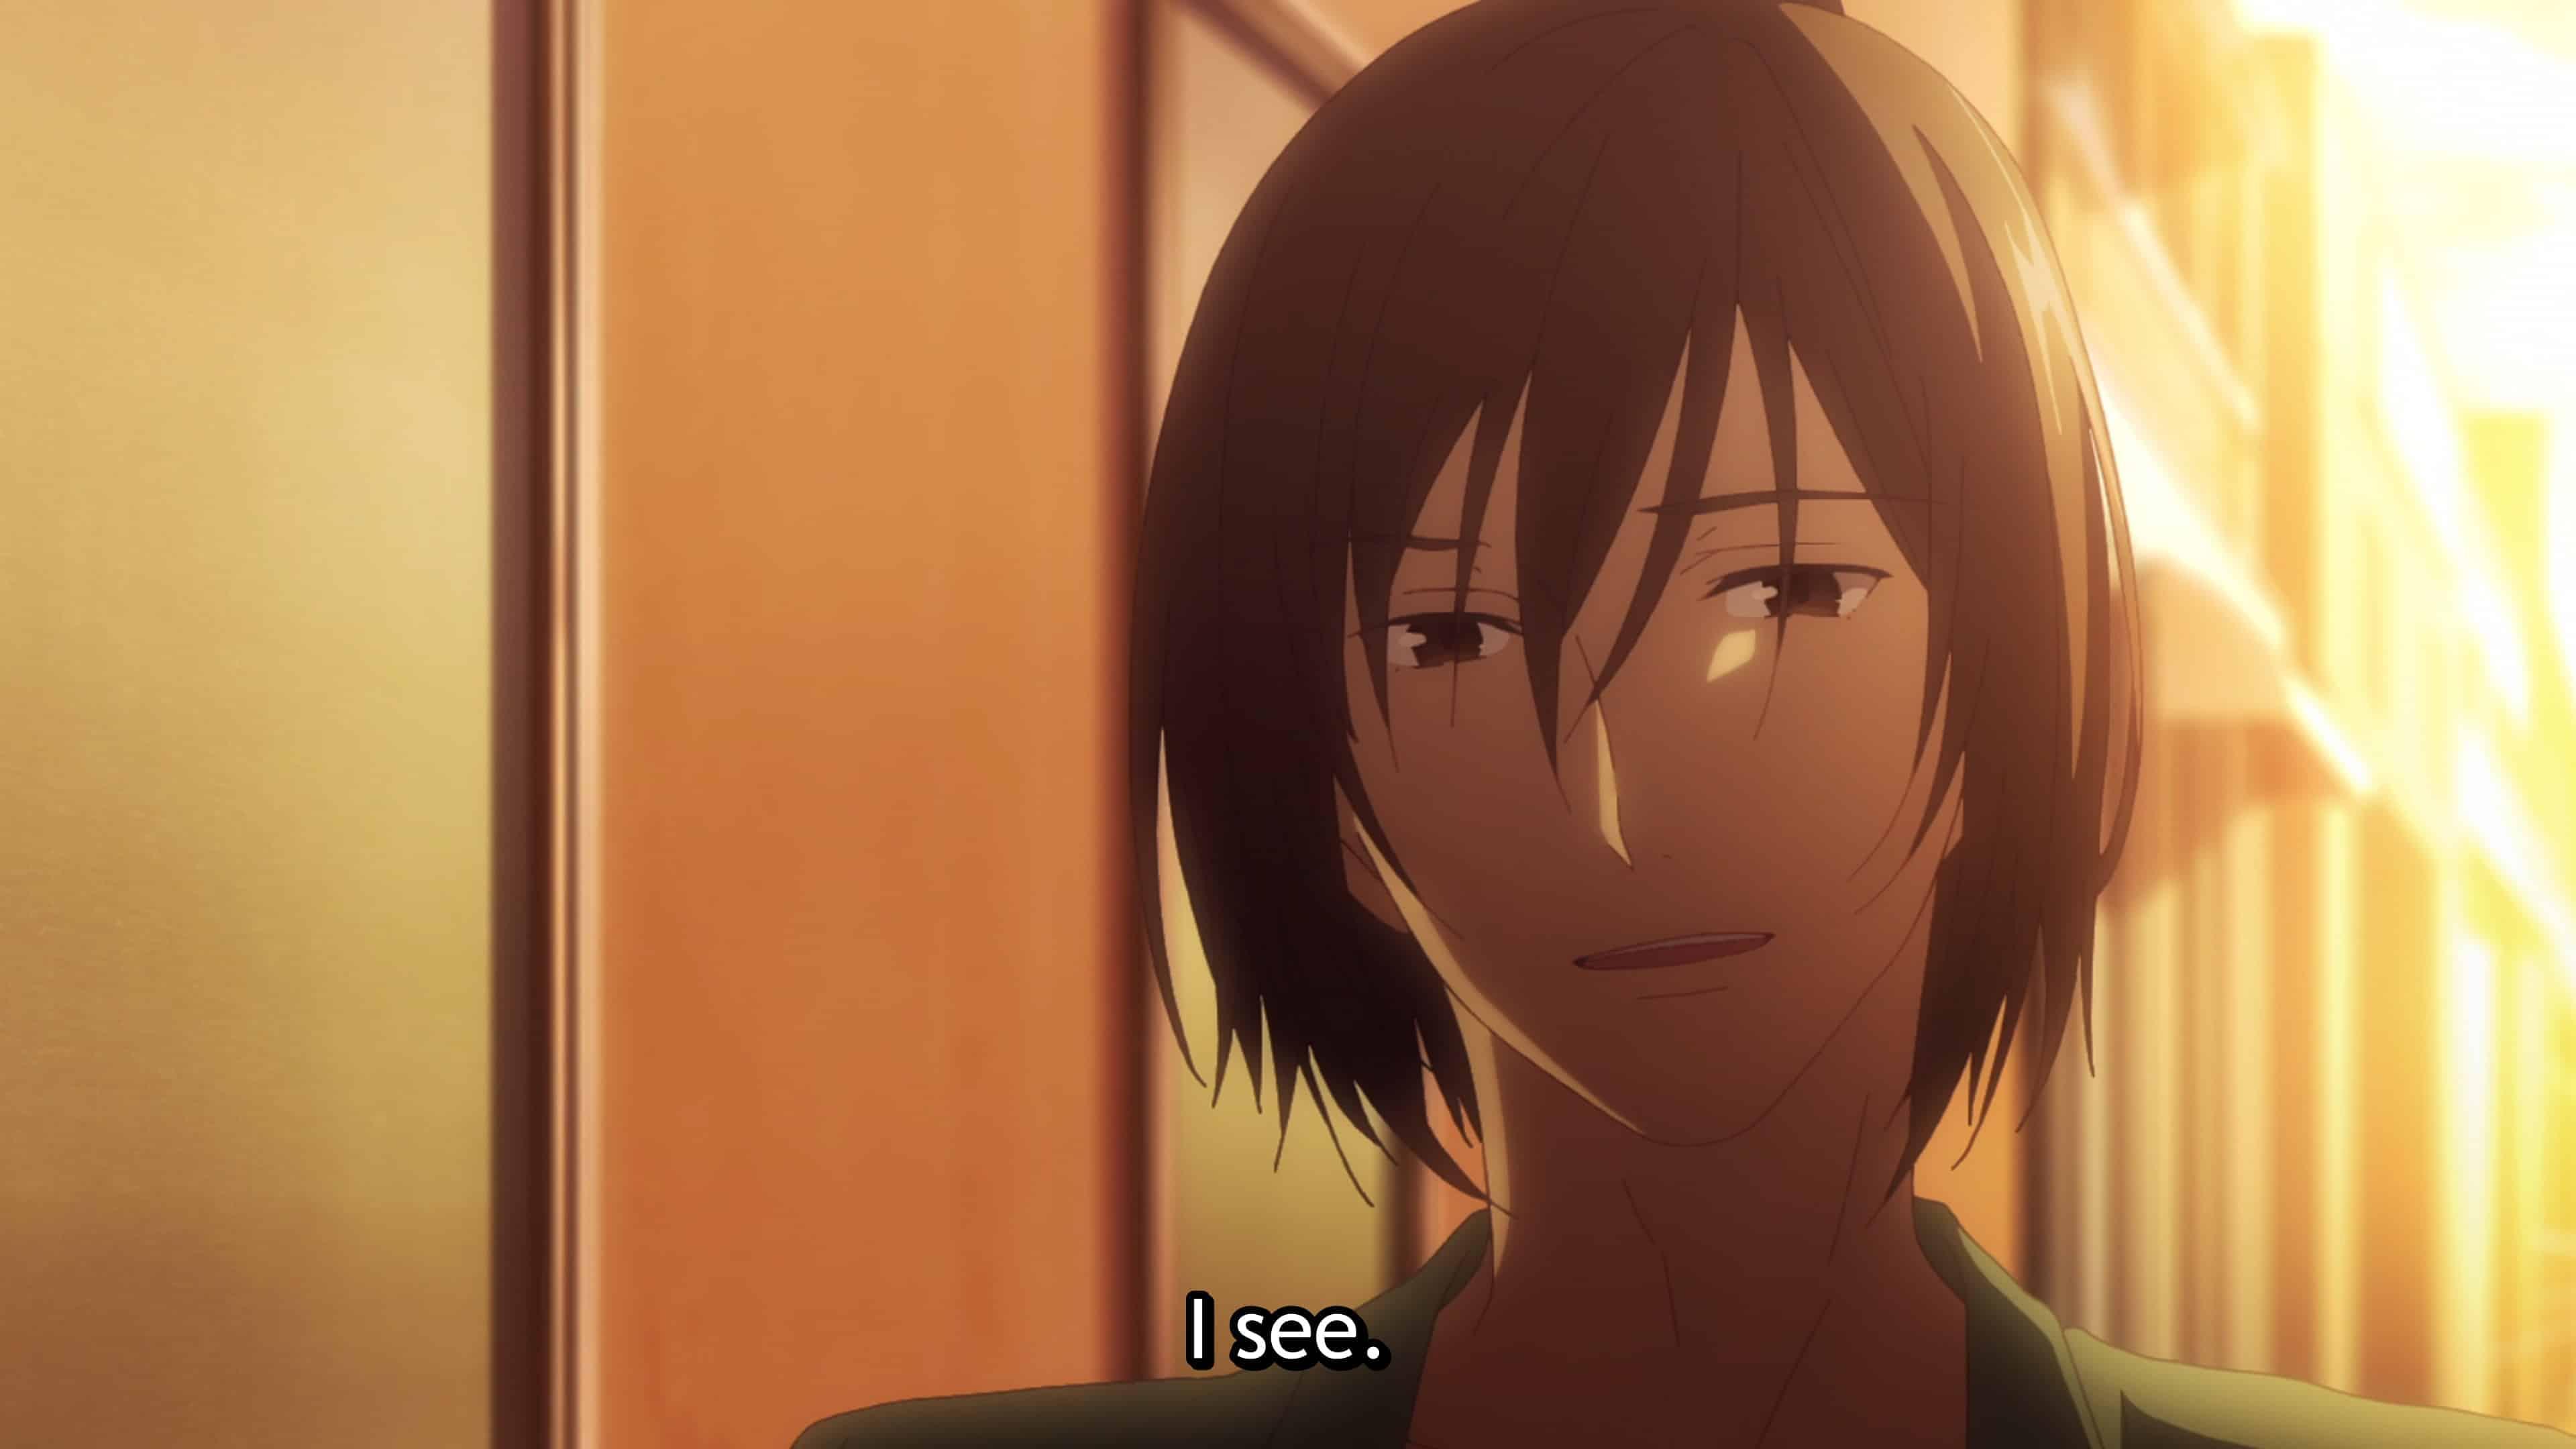 Yaguchi being a creep